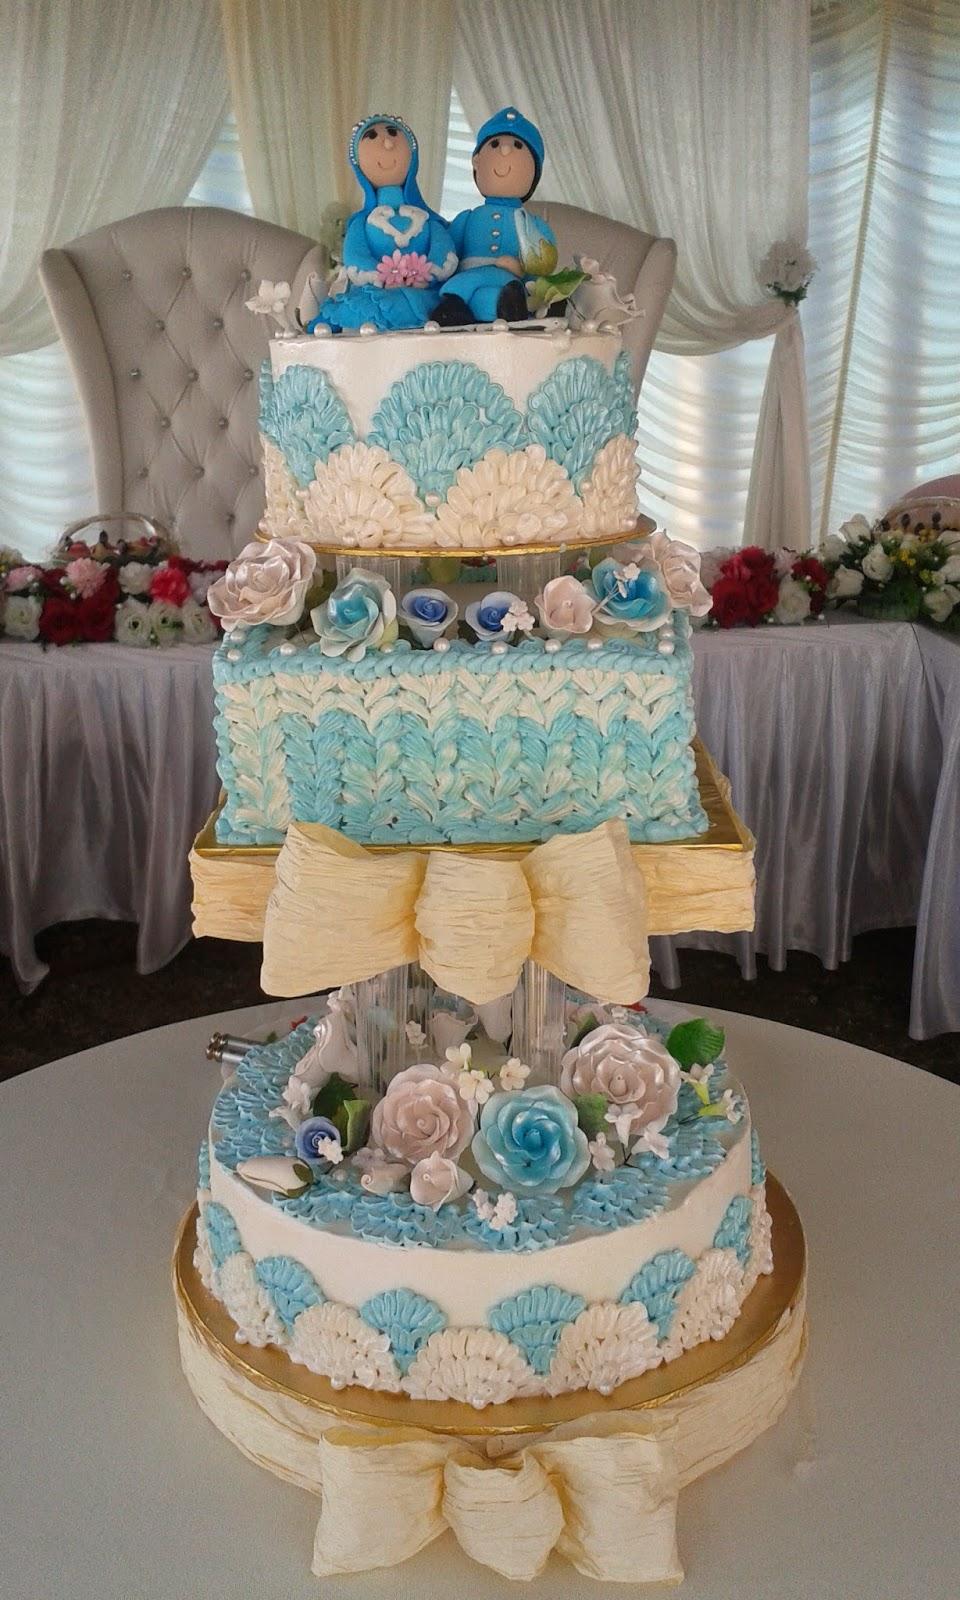 Cantik Cupcake: WEDDING CAKE/CUPCAKE TIER PRICE